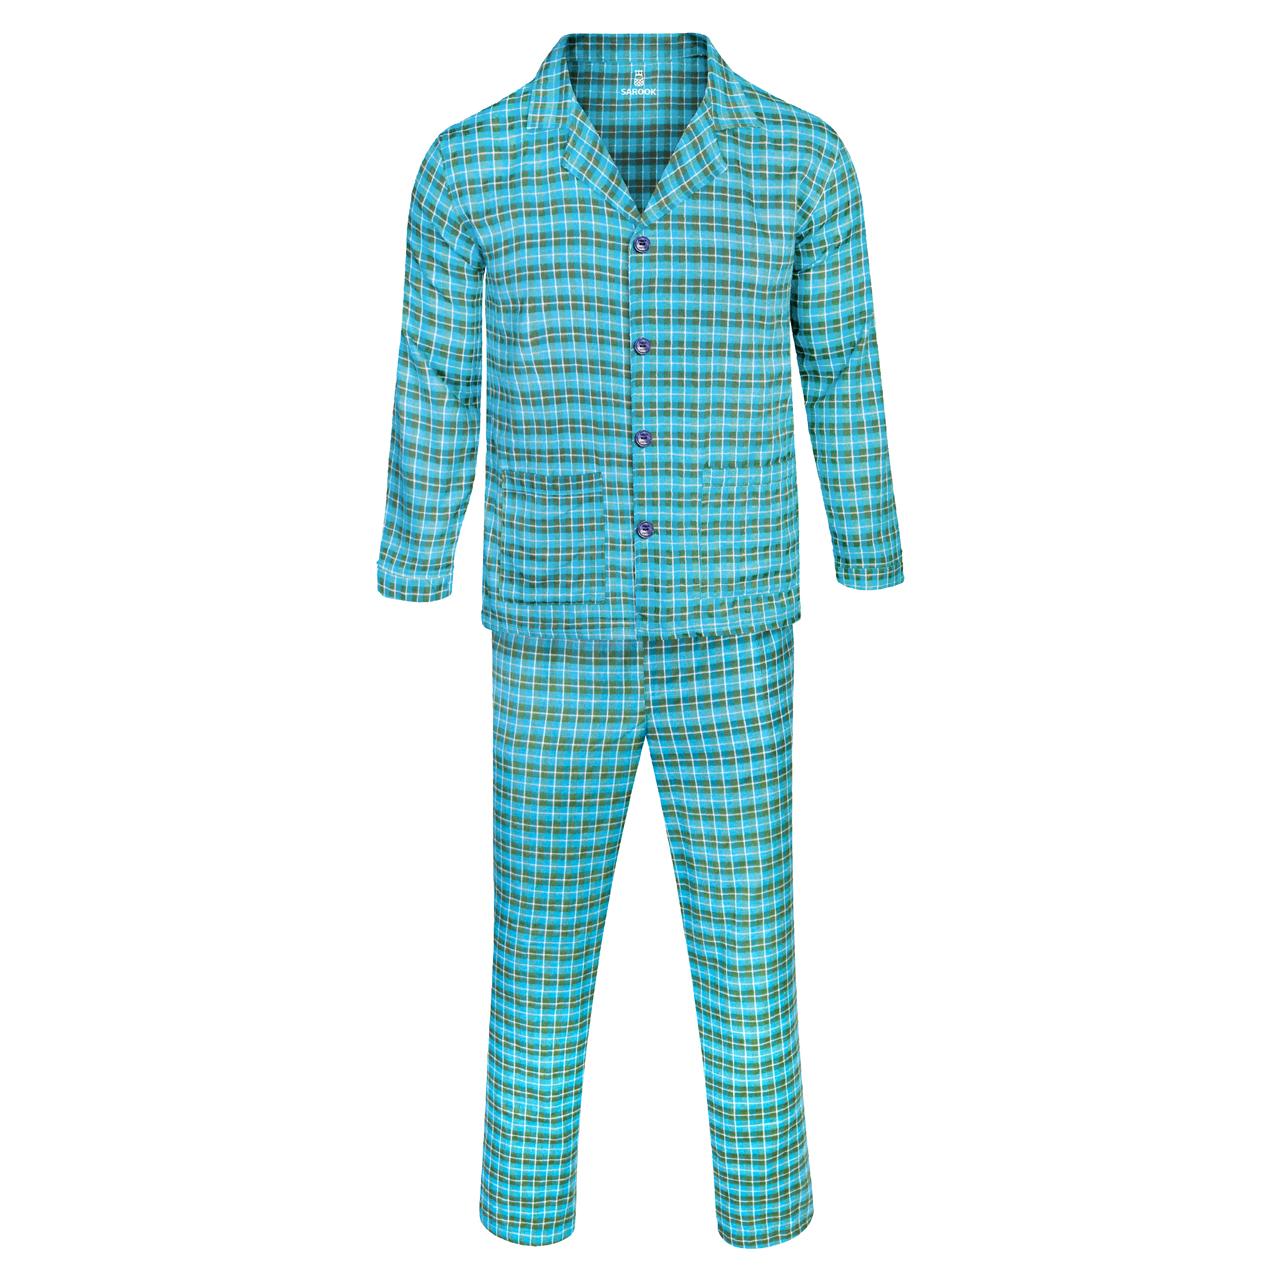 ست لباس راحتی مردانه ساروک مدل کشمیر کد04